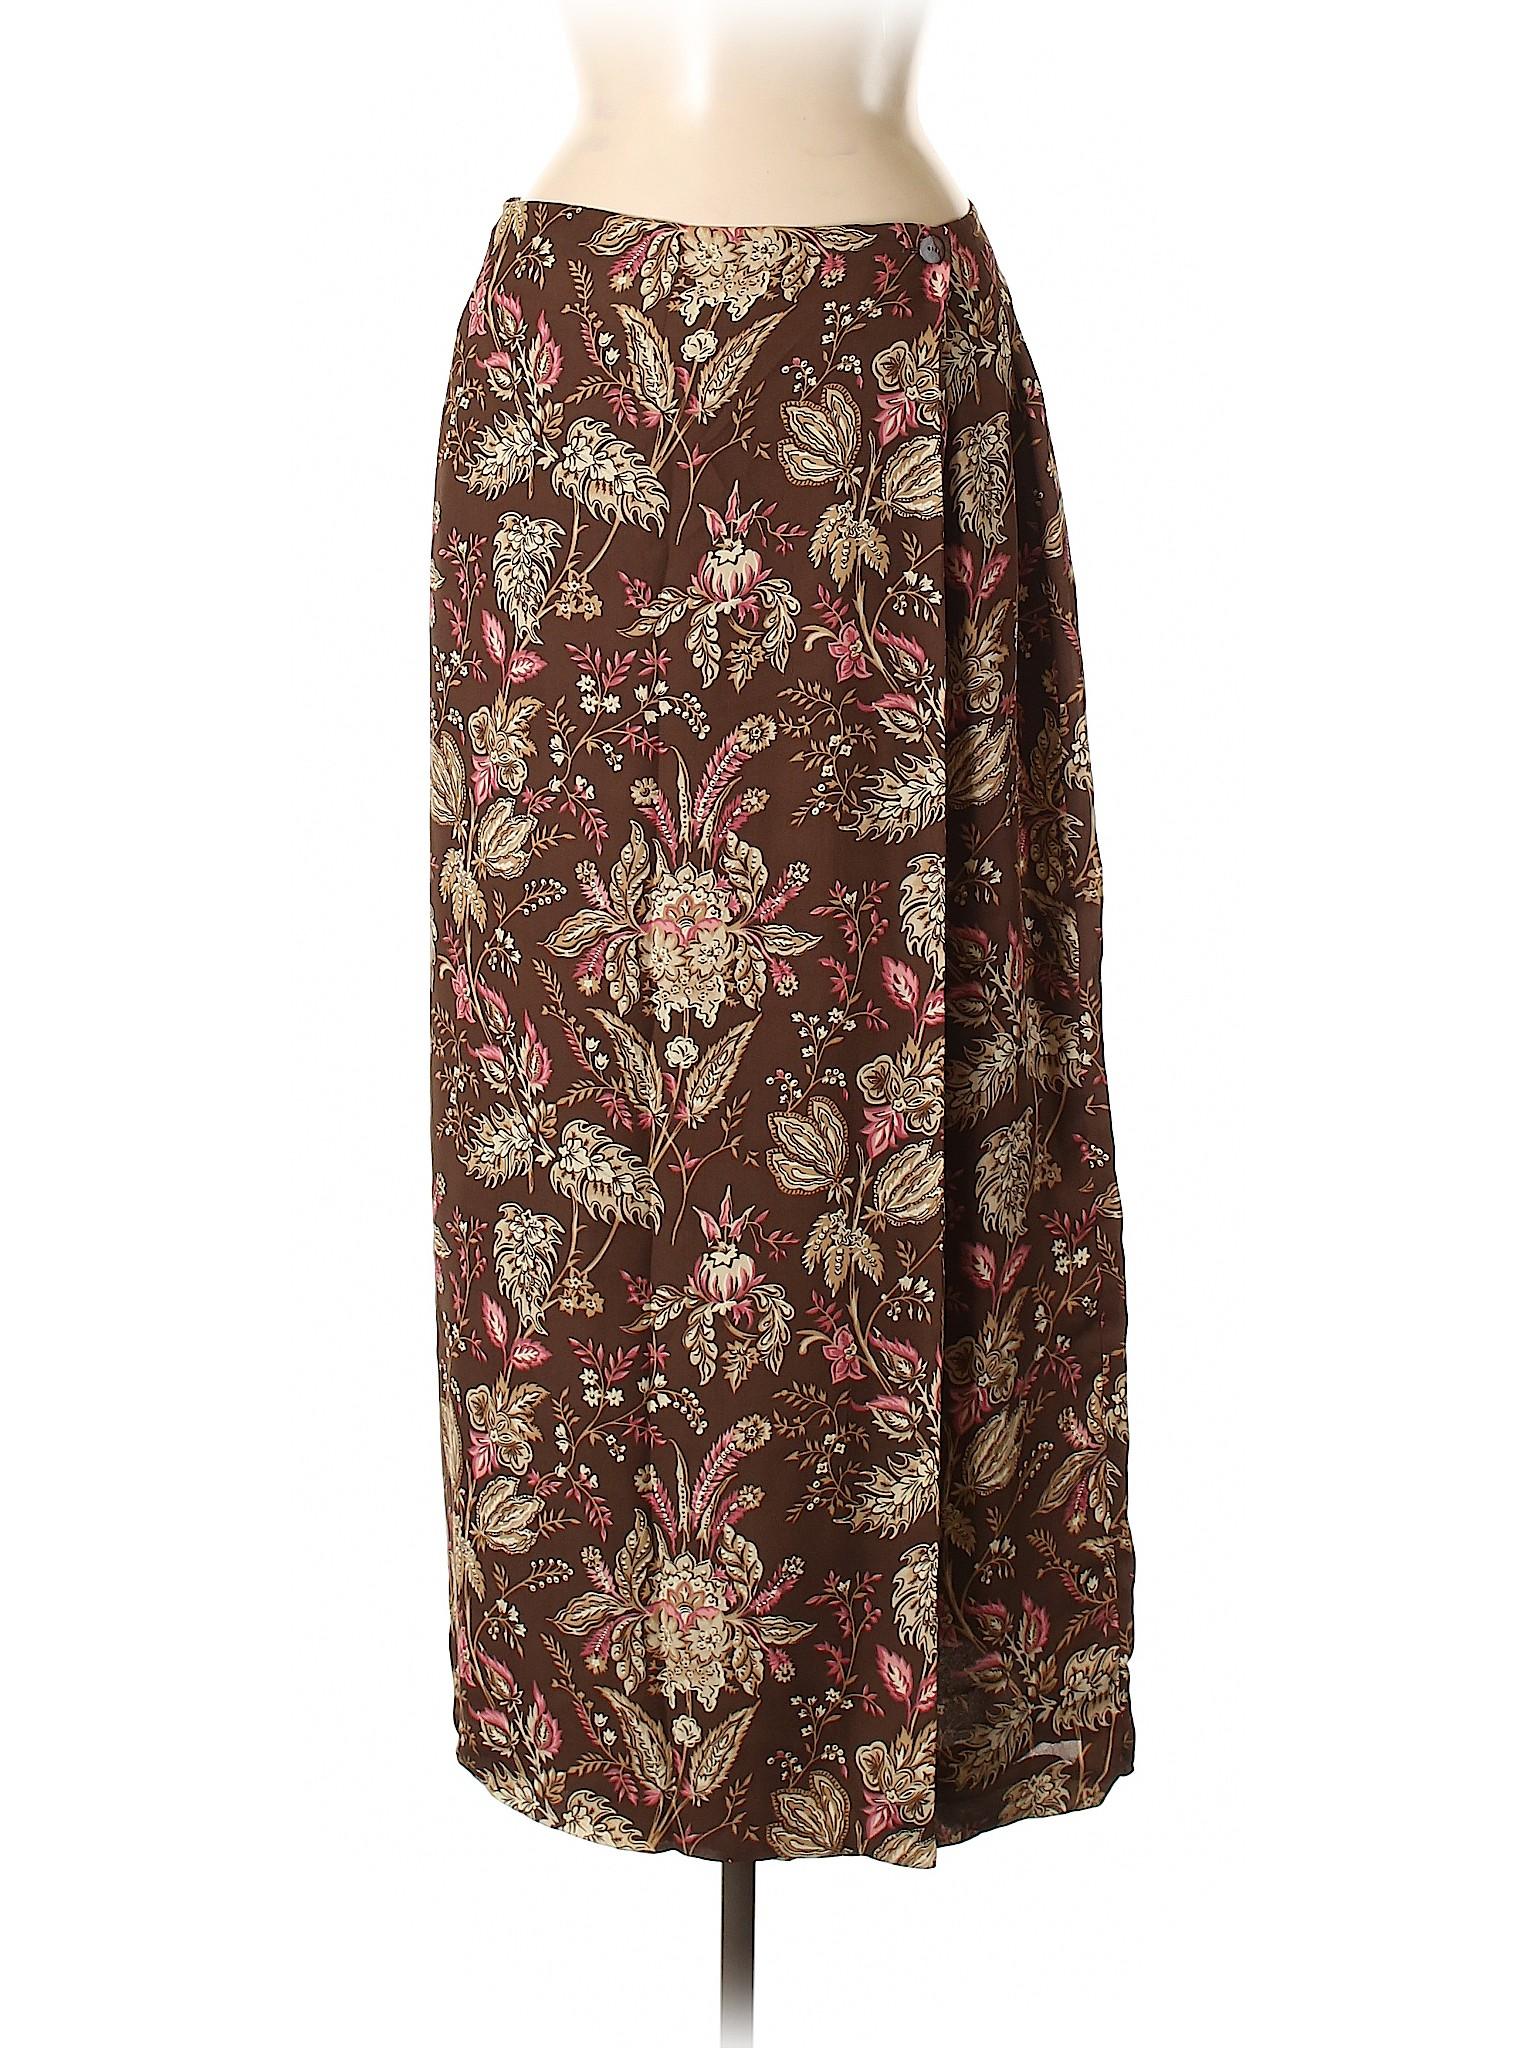 leisure Silk Boutique Club Skirt Charter Swtqtd6